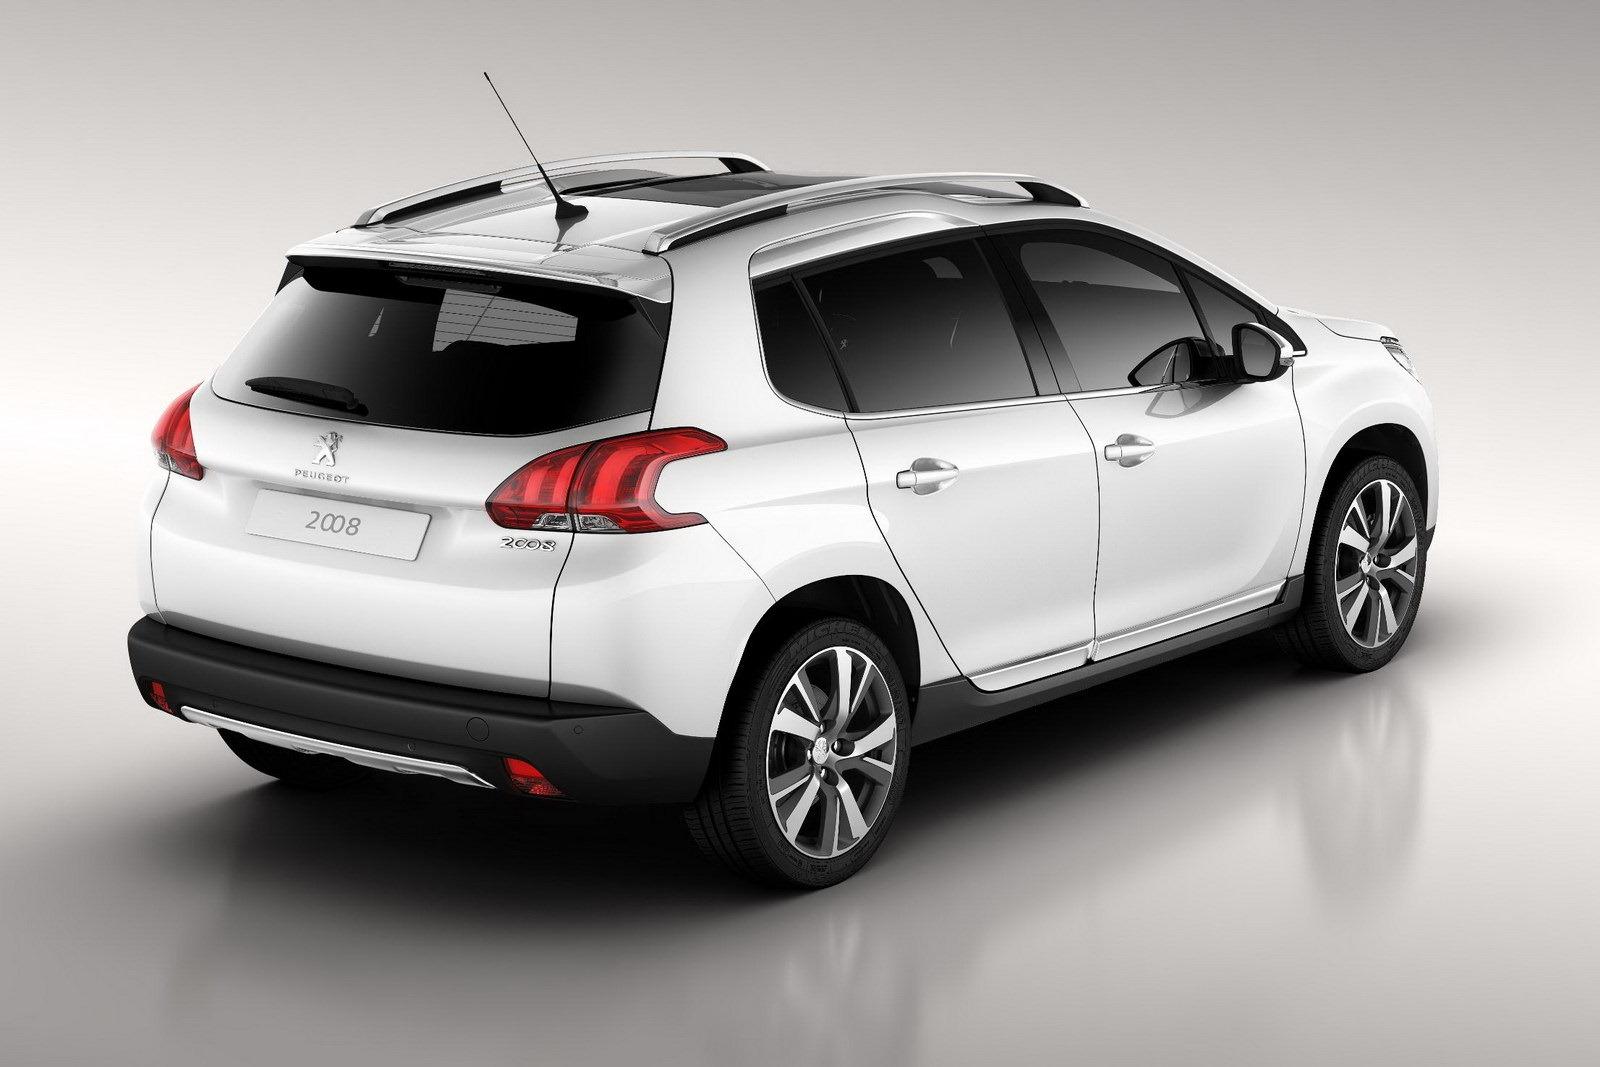 Spoiler All New Peugeot 2008 Automotive Car Manufacture